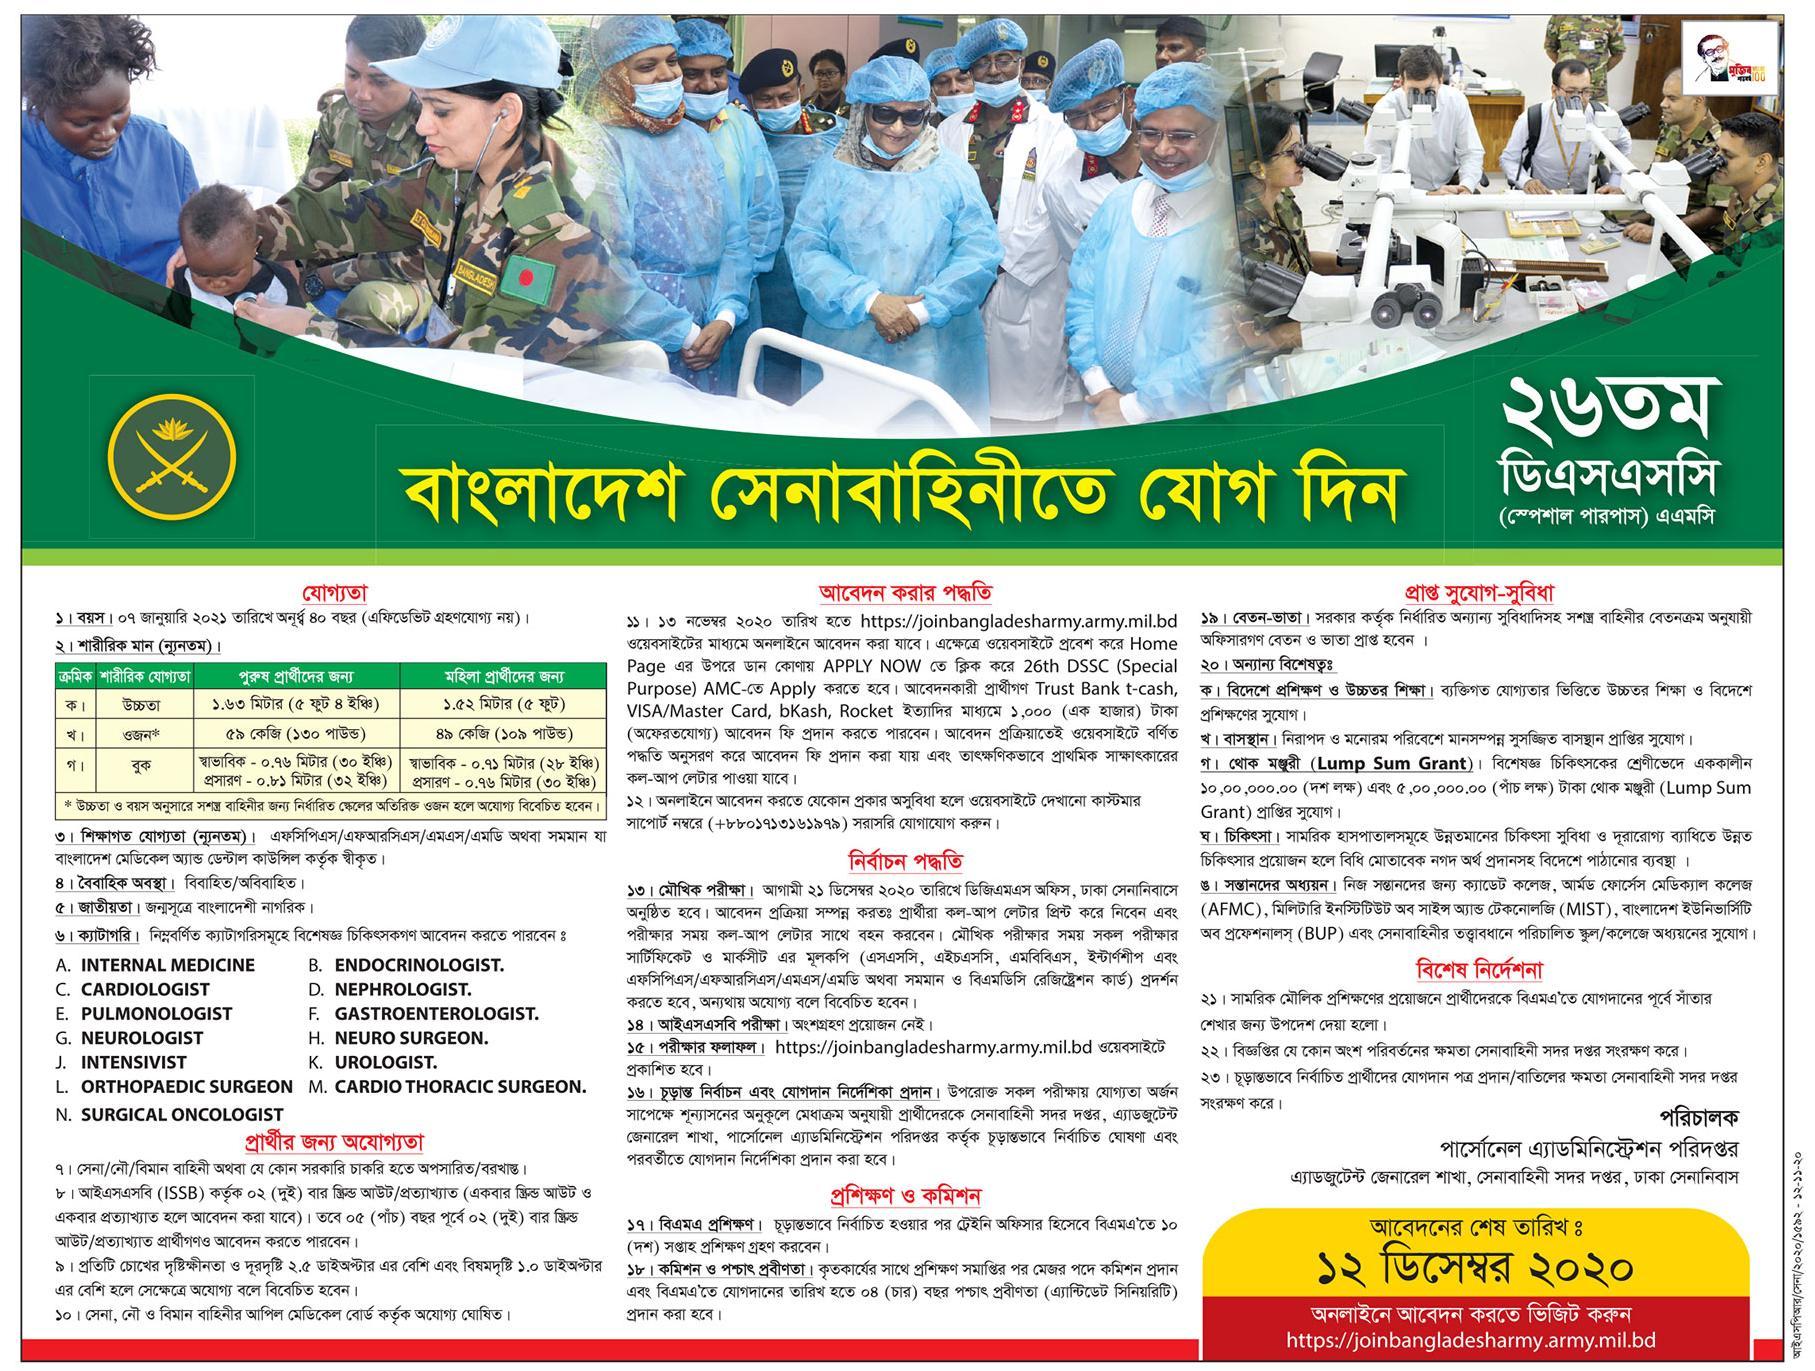 BD Army Job Circular